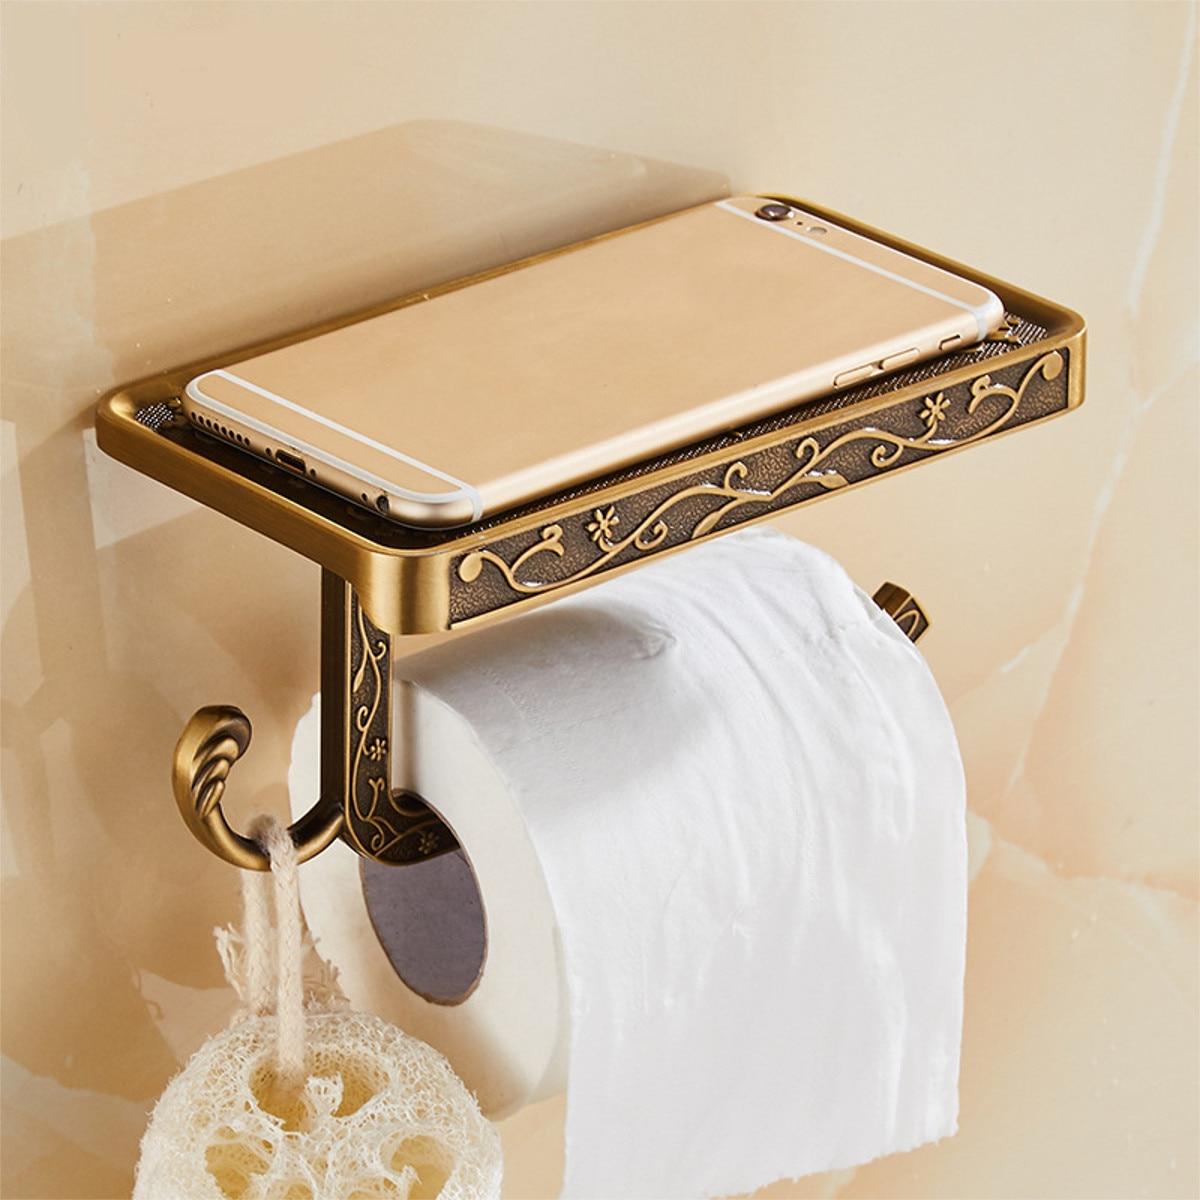 Antique Carved Zinc Alloy Bathroom Paper Mobile Phone Holder With Shelf Bathroom Towel Rack Toilet Paper Holder Tissue BoxesAntique Carved Zinc Alloy Bathroom Paper Mobile Phone Holder With Shelf Bathroom Towel Rack Toilet Paper Holder Tissue Boxes